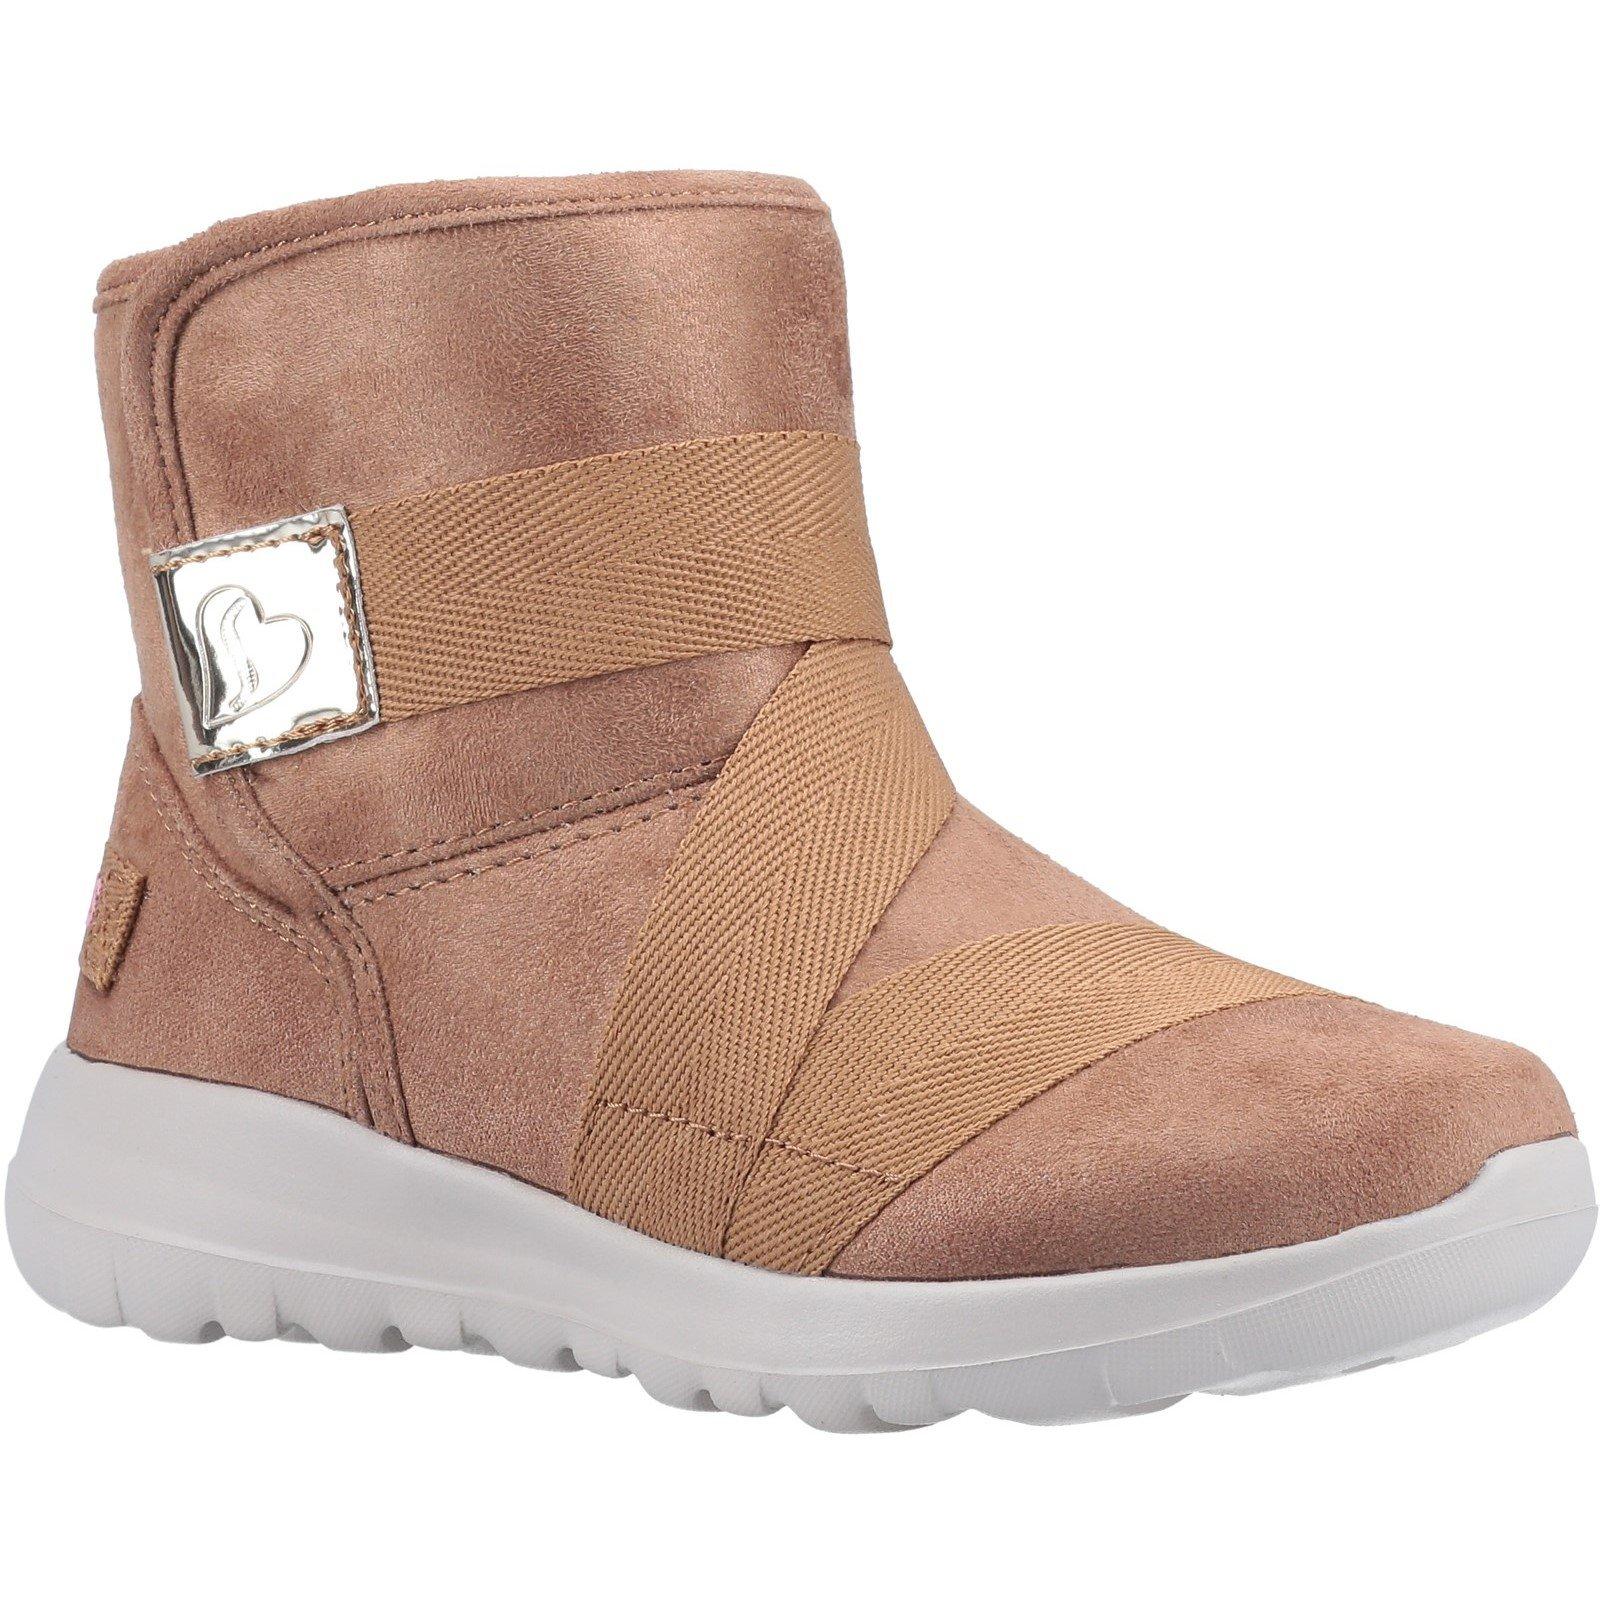 Skechers Unisex Go Walk Joy Strong Willed Ankle Boot Chestnut 31167 - Chestnut 4